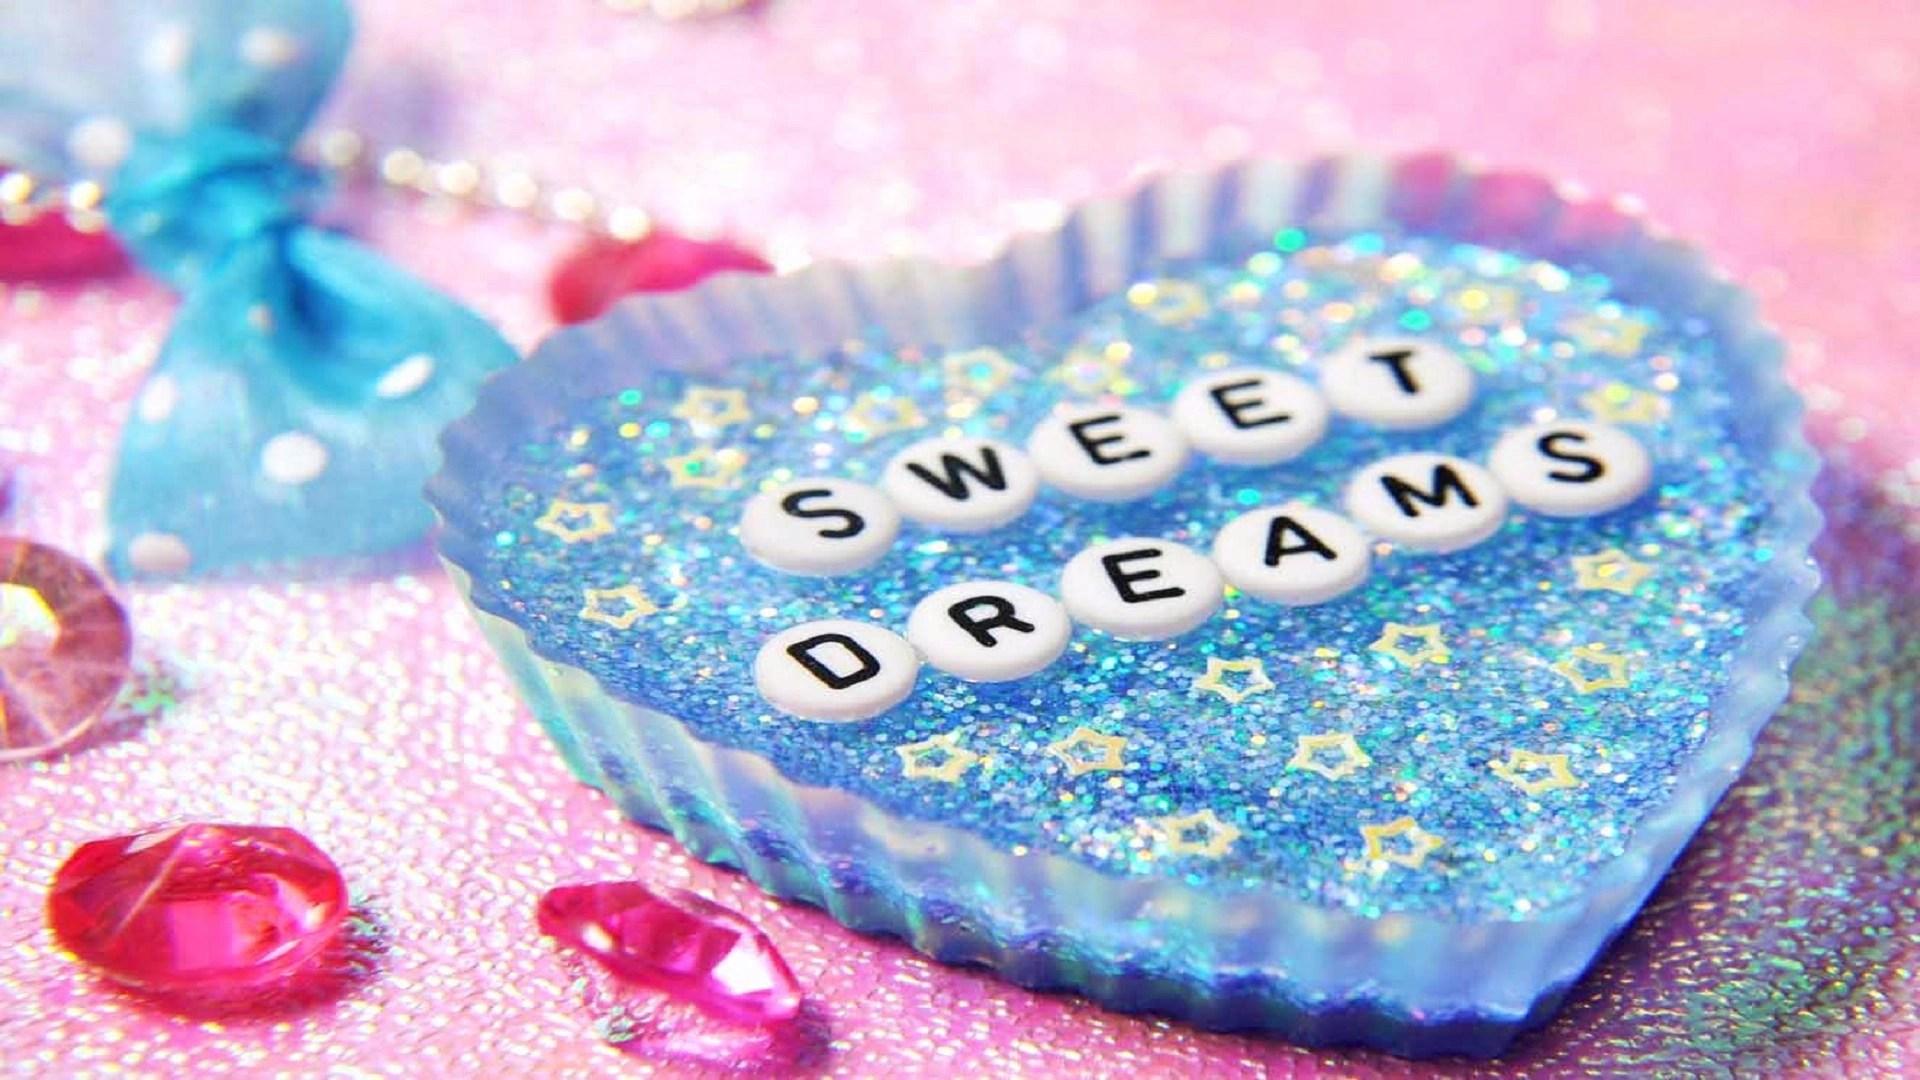 good night heart pink sweed dreams image